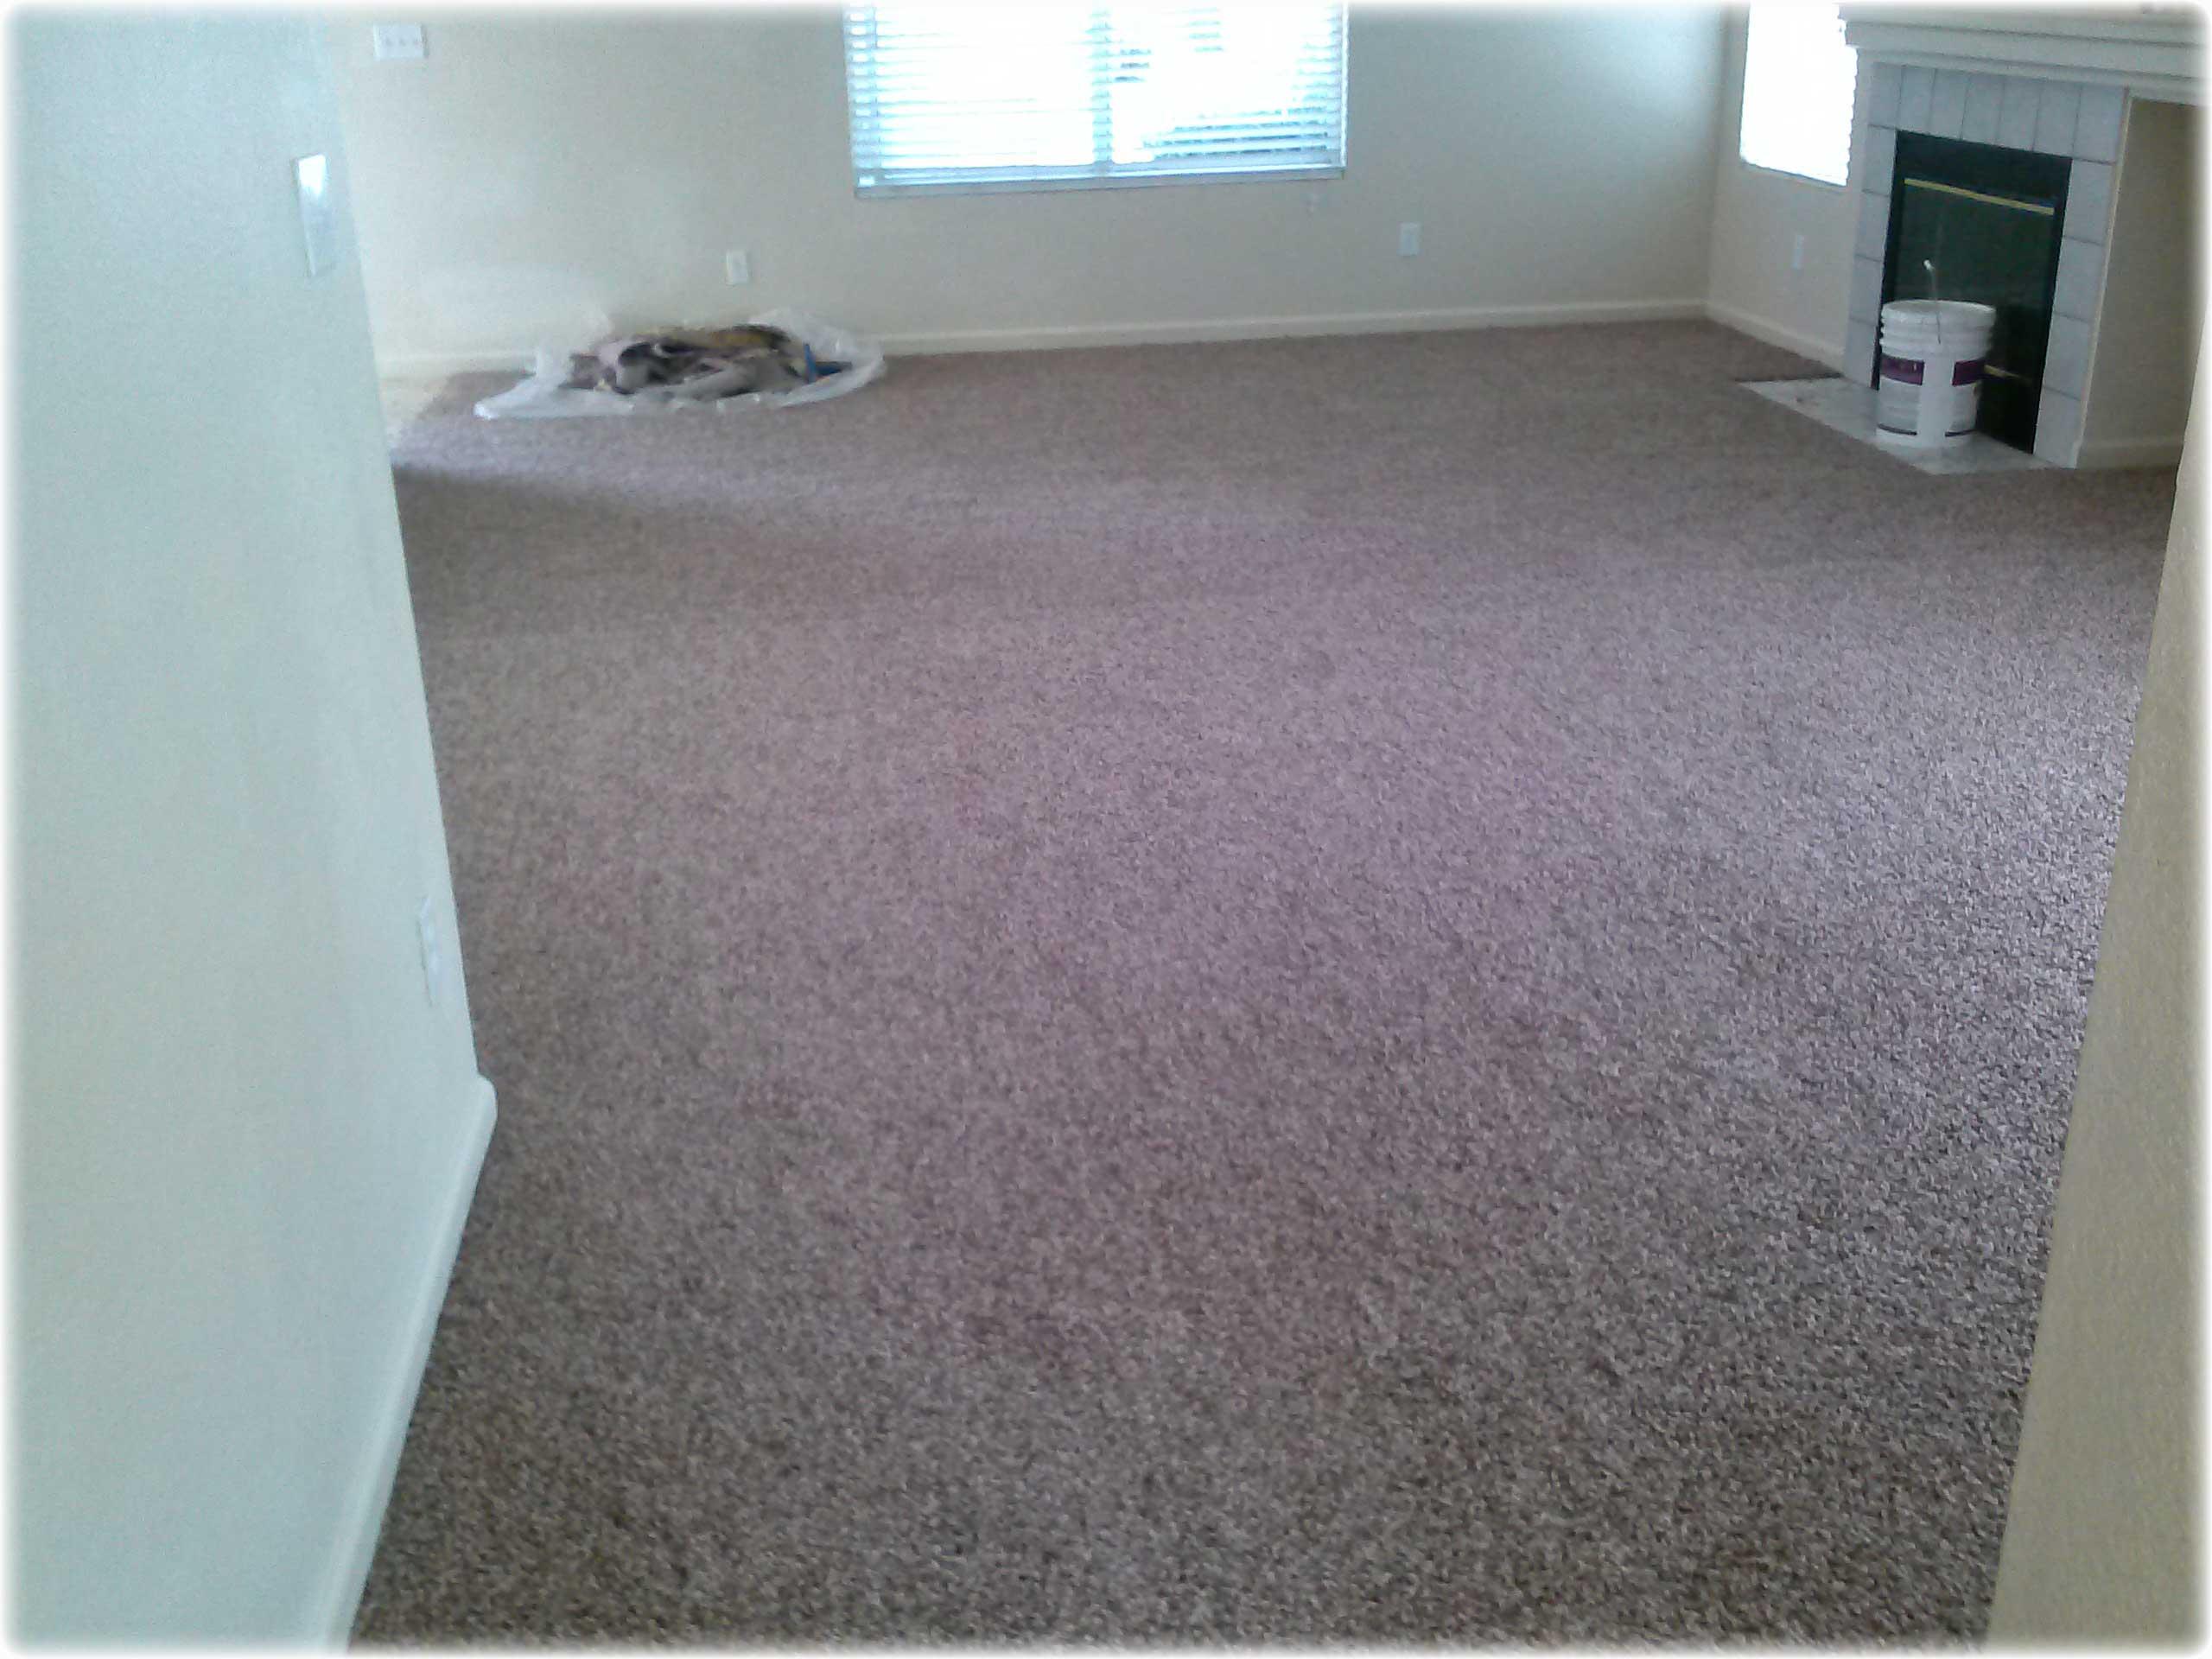 Carpet Restretching Seattle Carpet Vidalondon